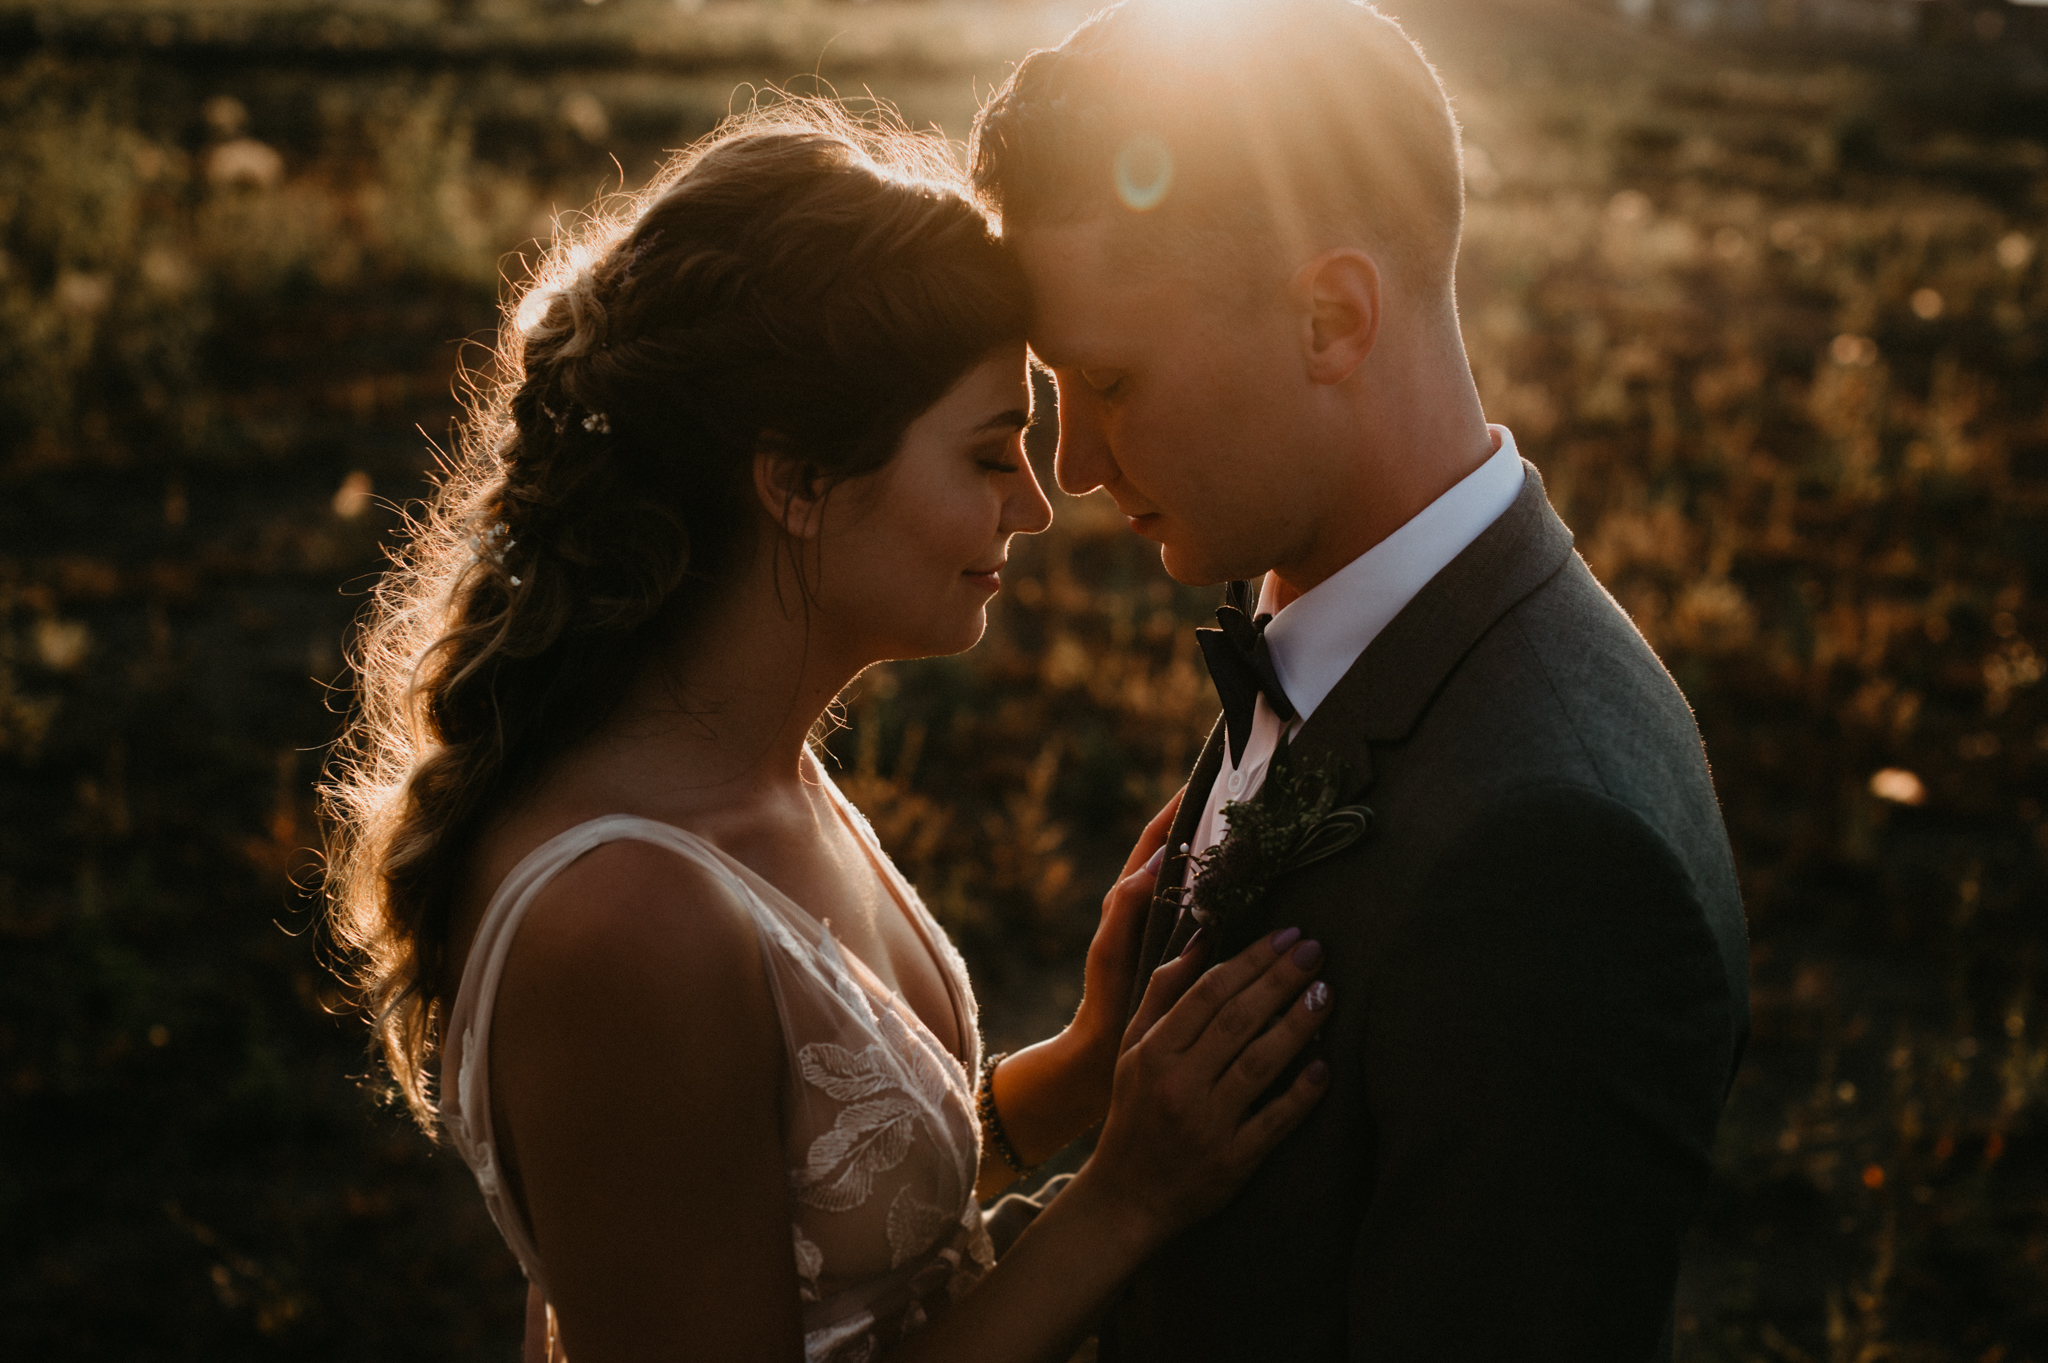 Boho_Wedding_Edmonton_Wedding_Photographer_Carlos_Vicente.jpg